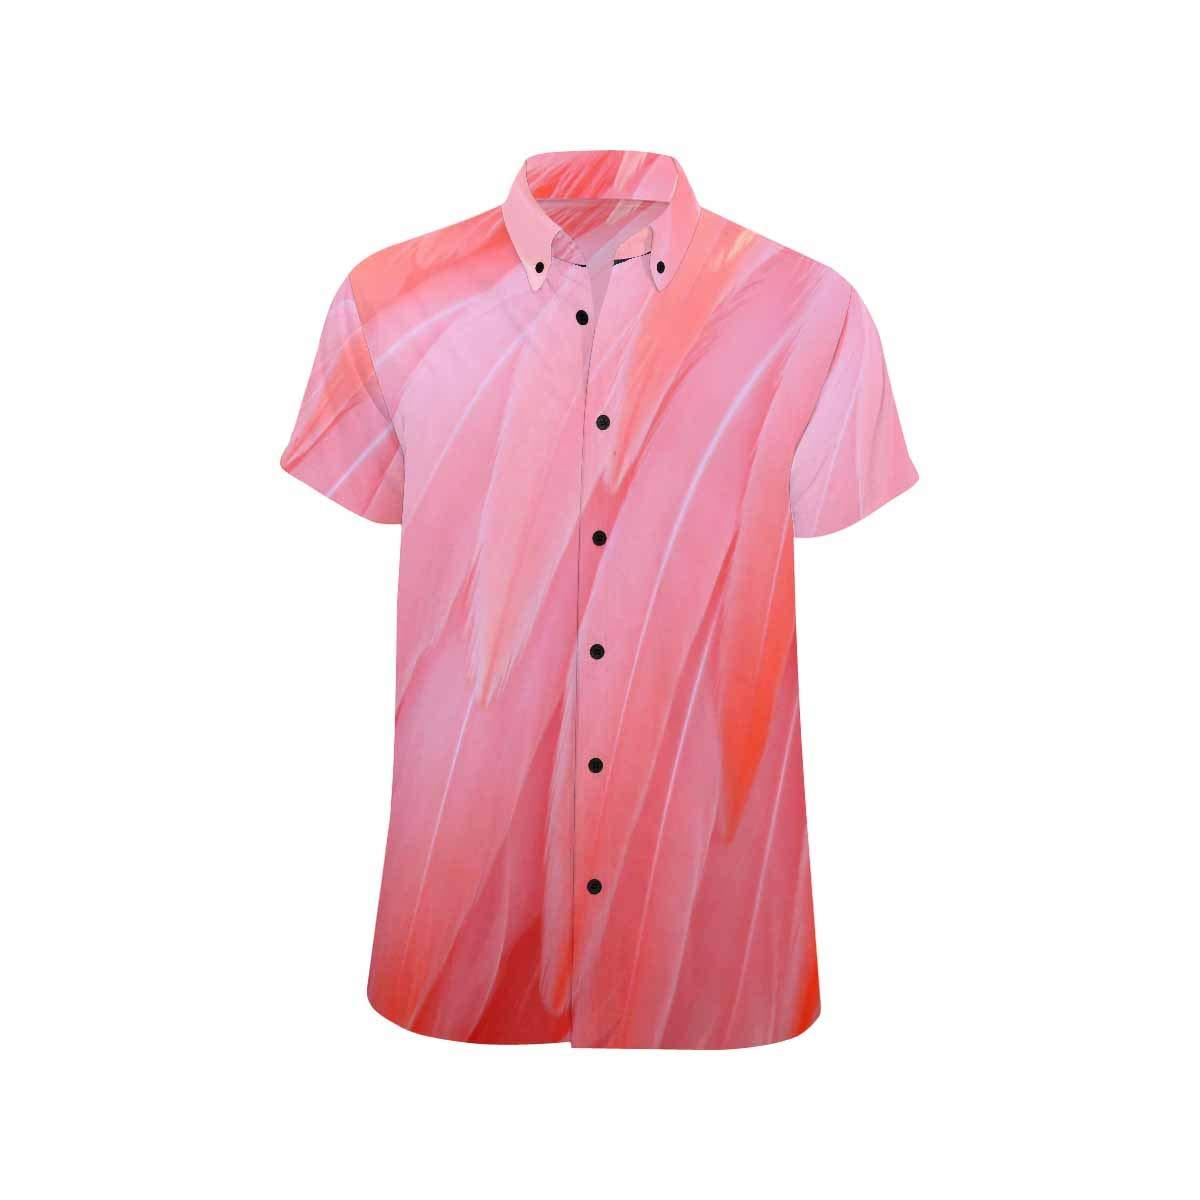 InterestPrint Casual Breadfruit Casual Button Down Beach Shirts S-5XL